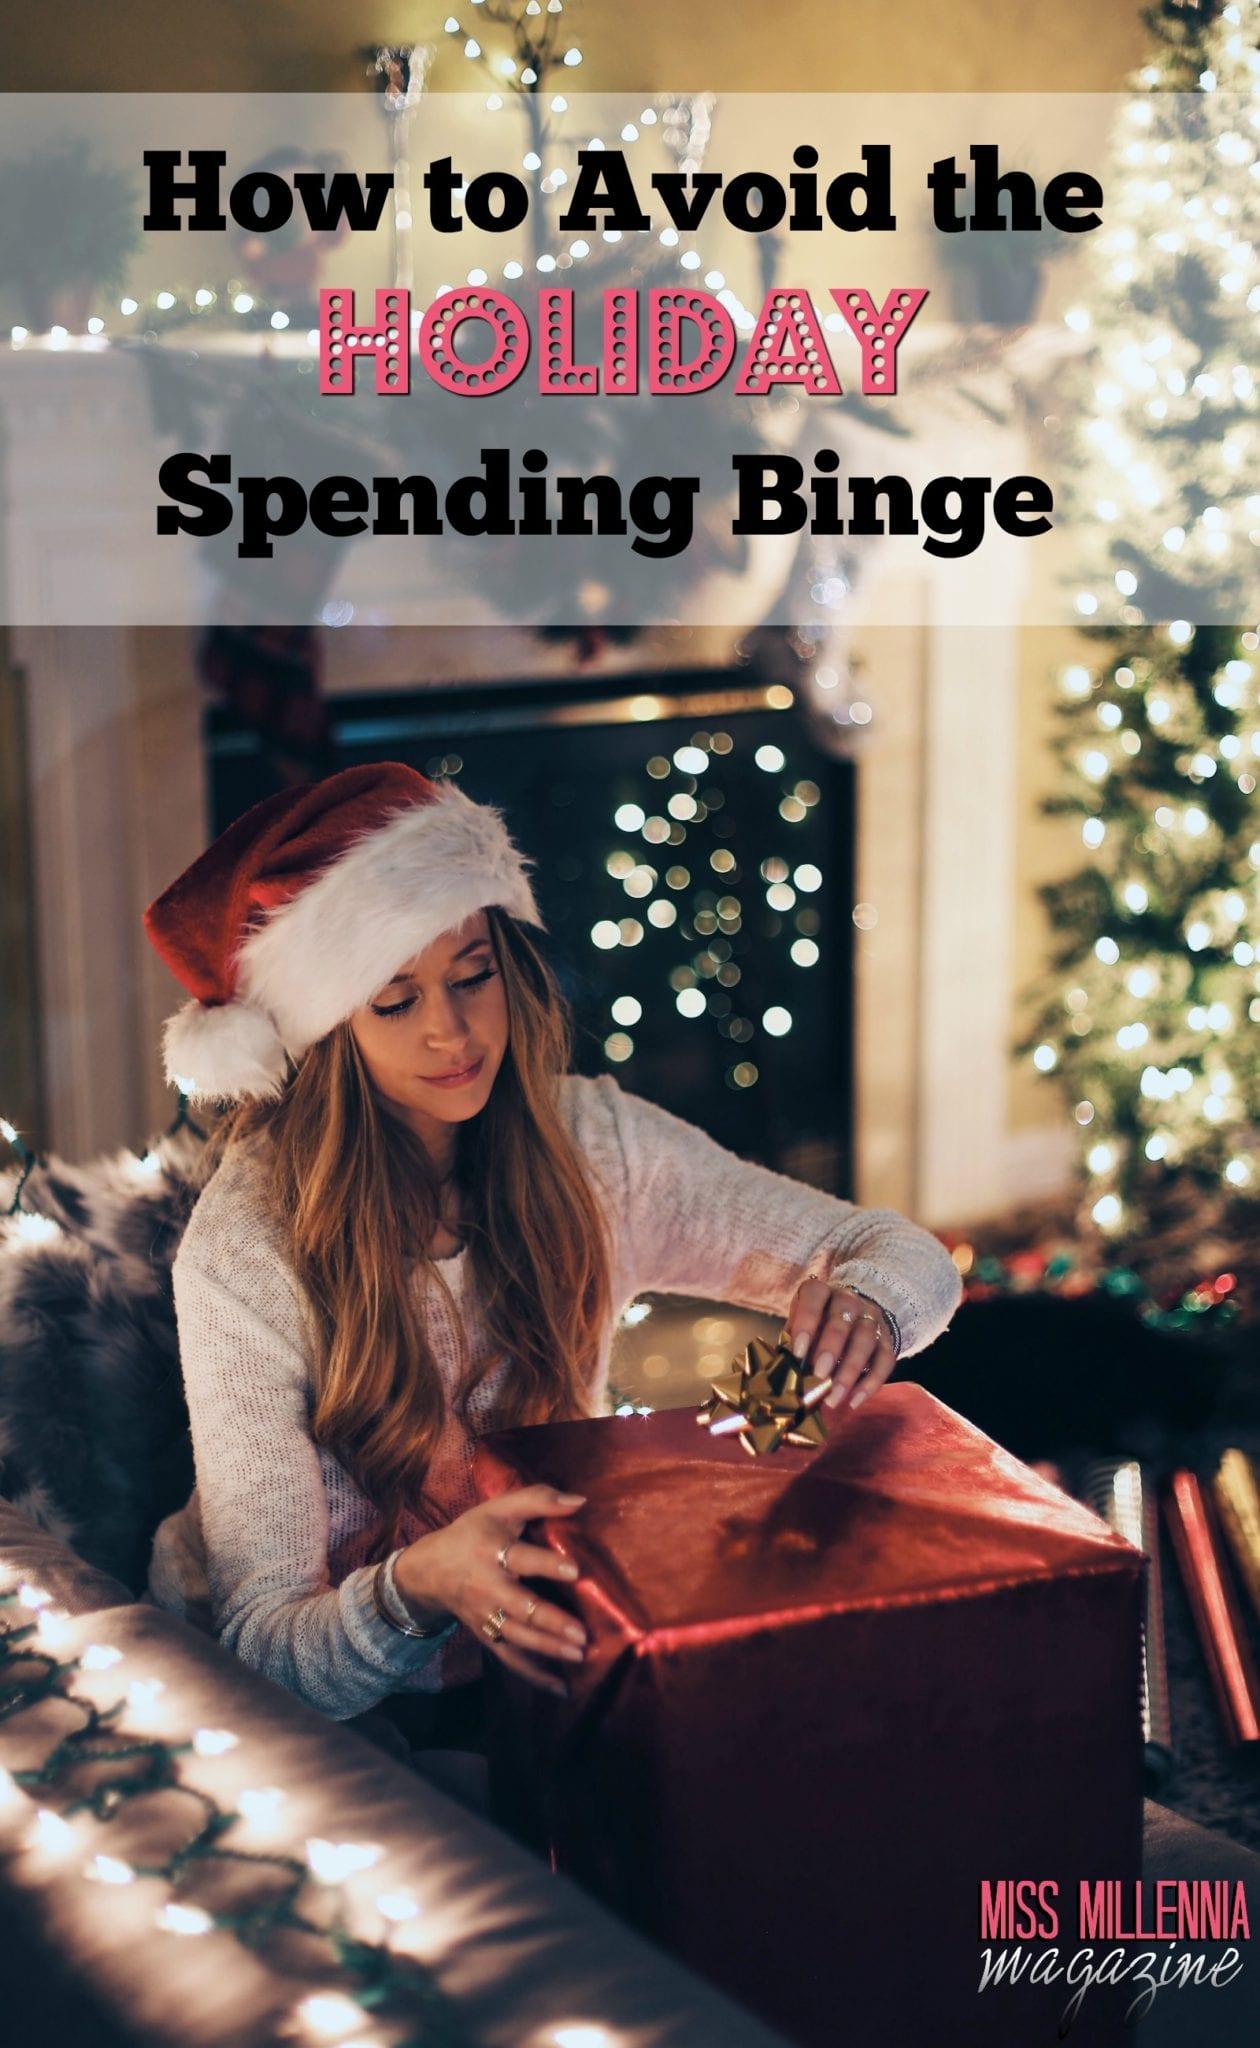 How to Avoid the Holiday Spending Binge